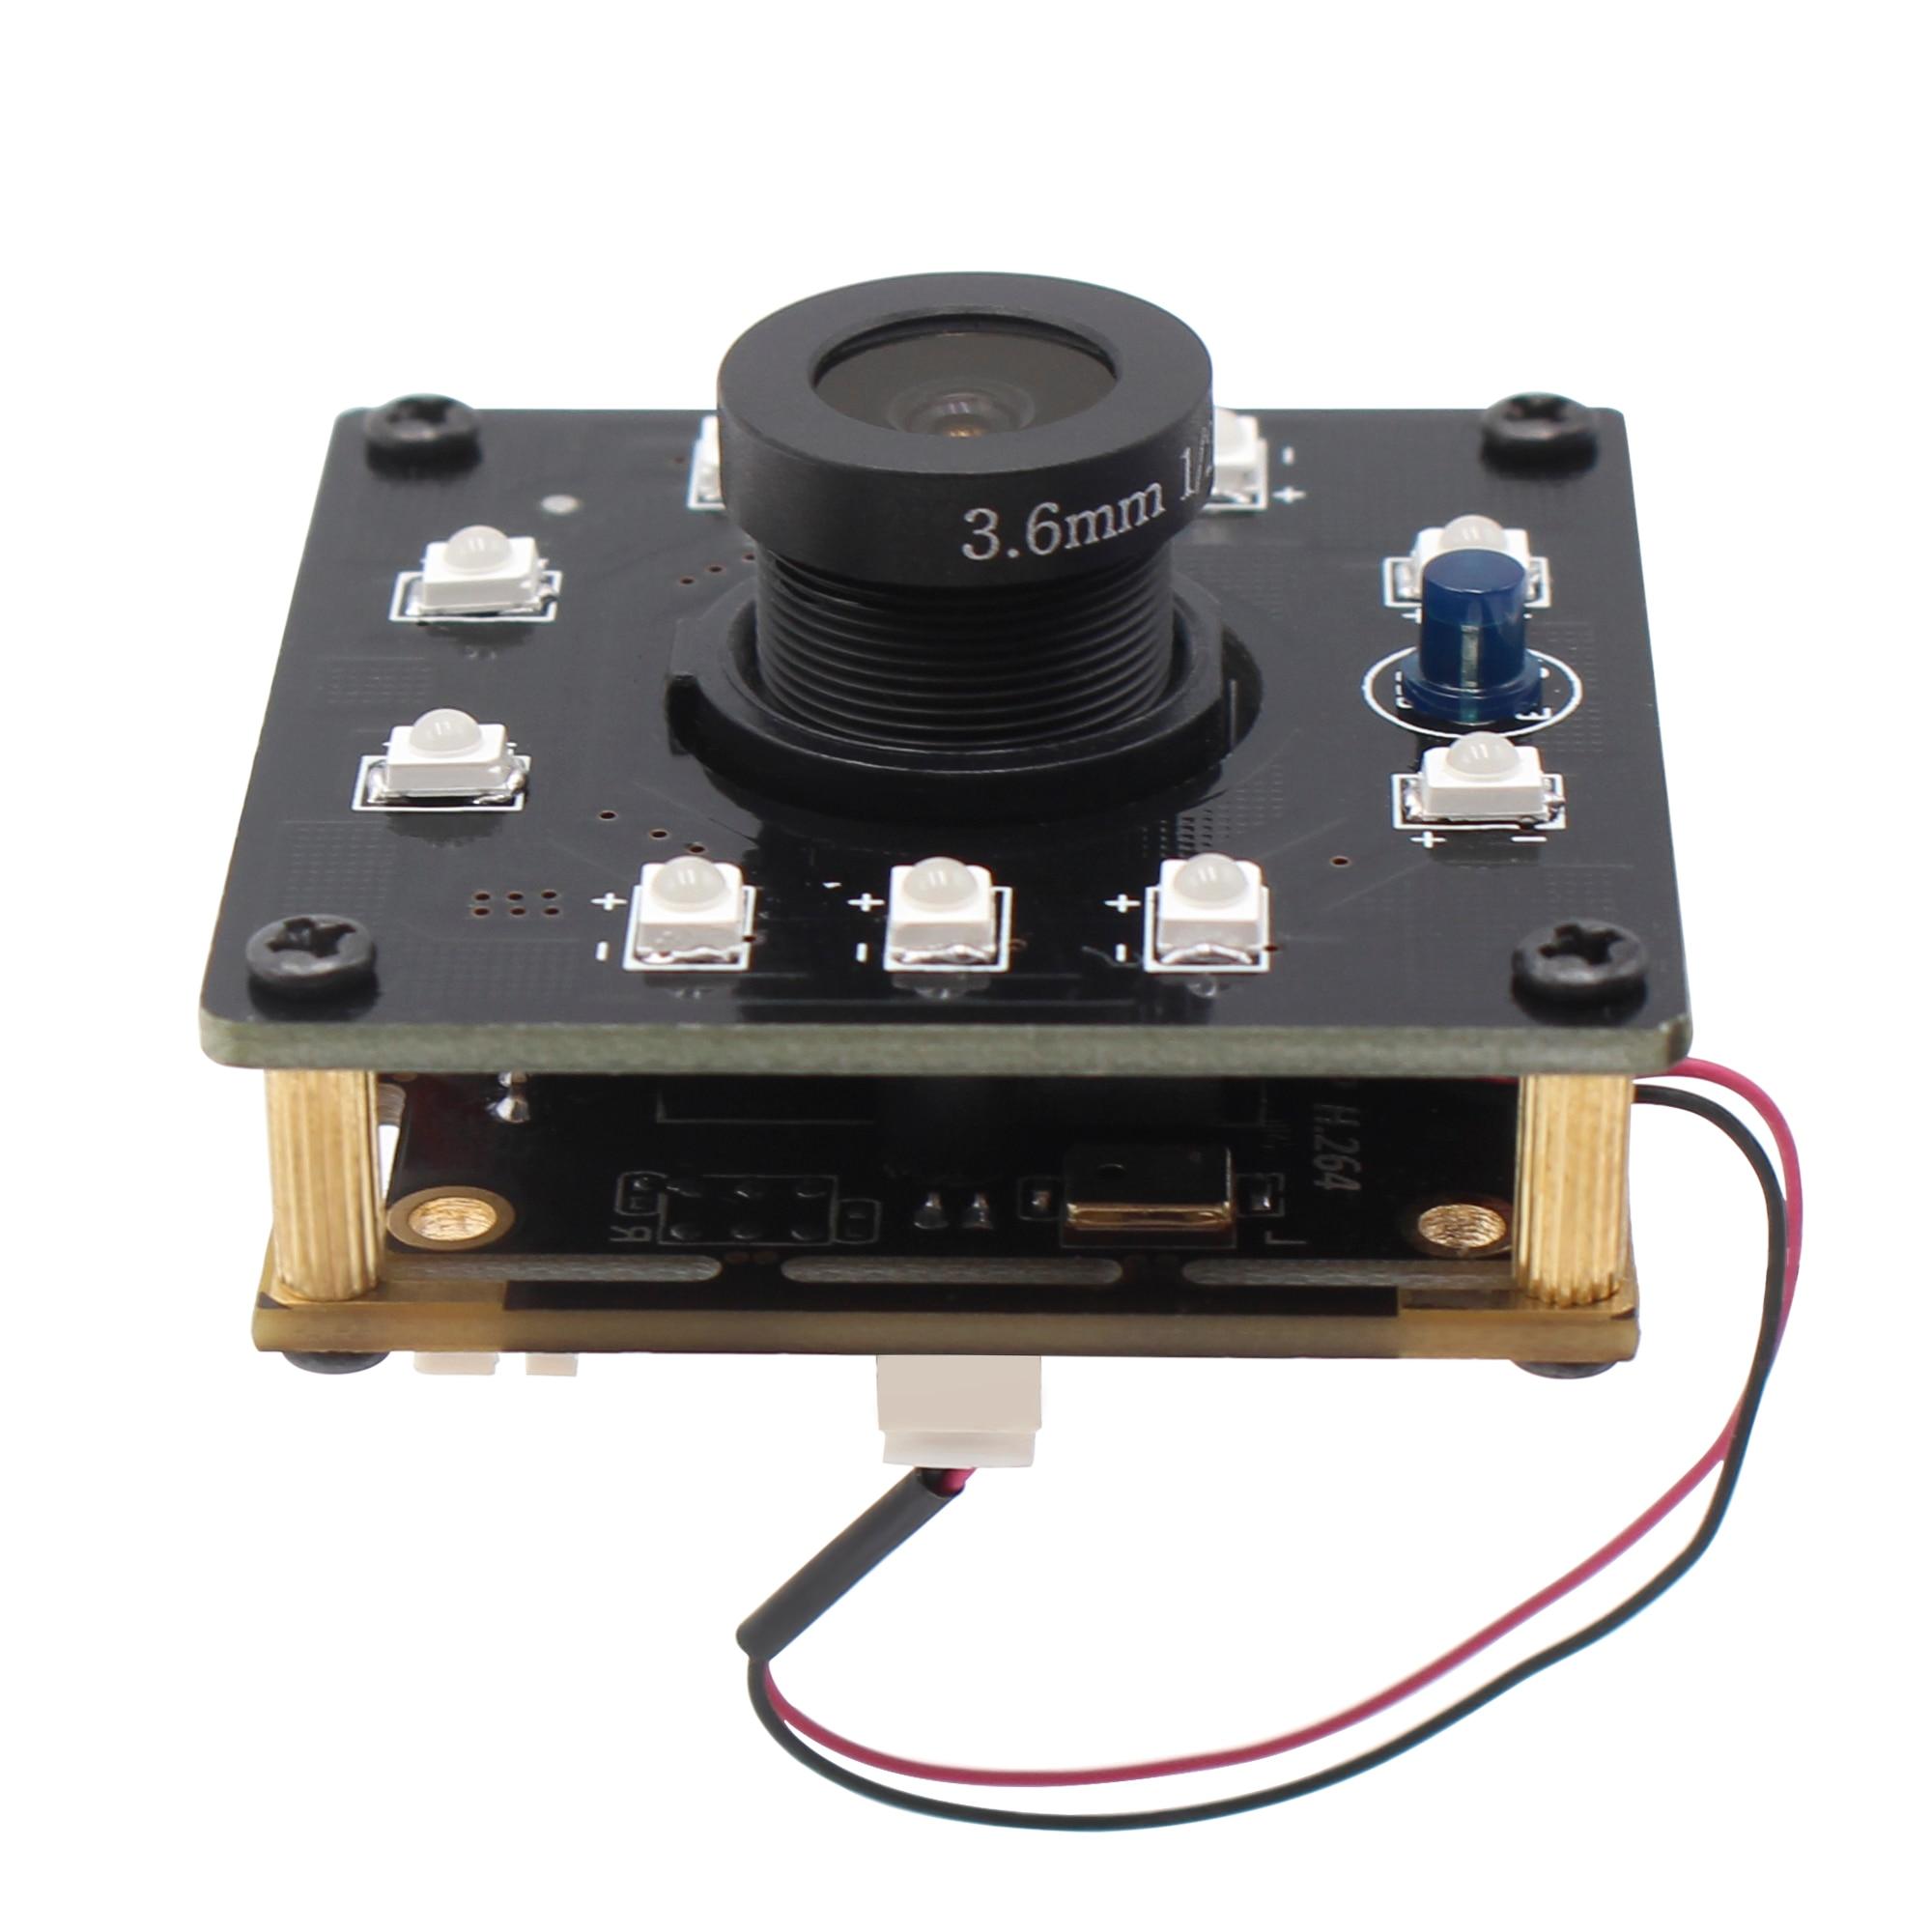 ELP 5mp 2592X1944 alta velocidad Aptina MI5100 HD MJPEG IR CUT infrarrojo visión nocturna Usb Cmos módulo de cámara